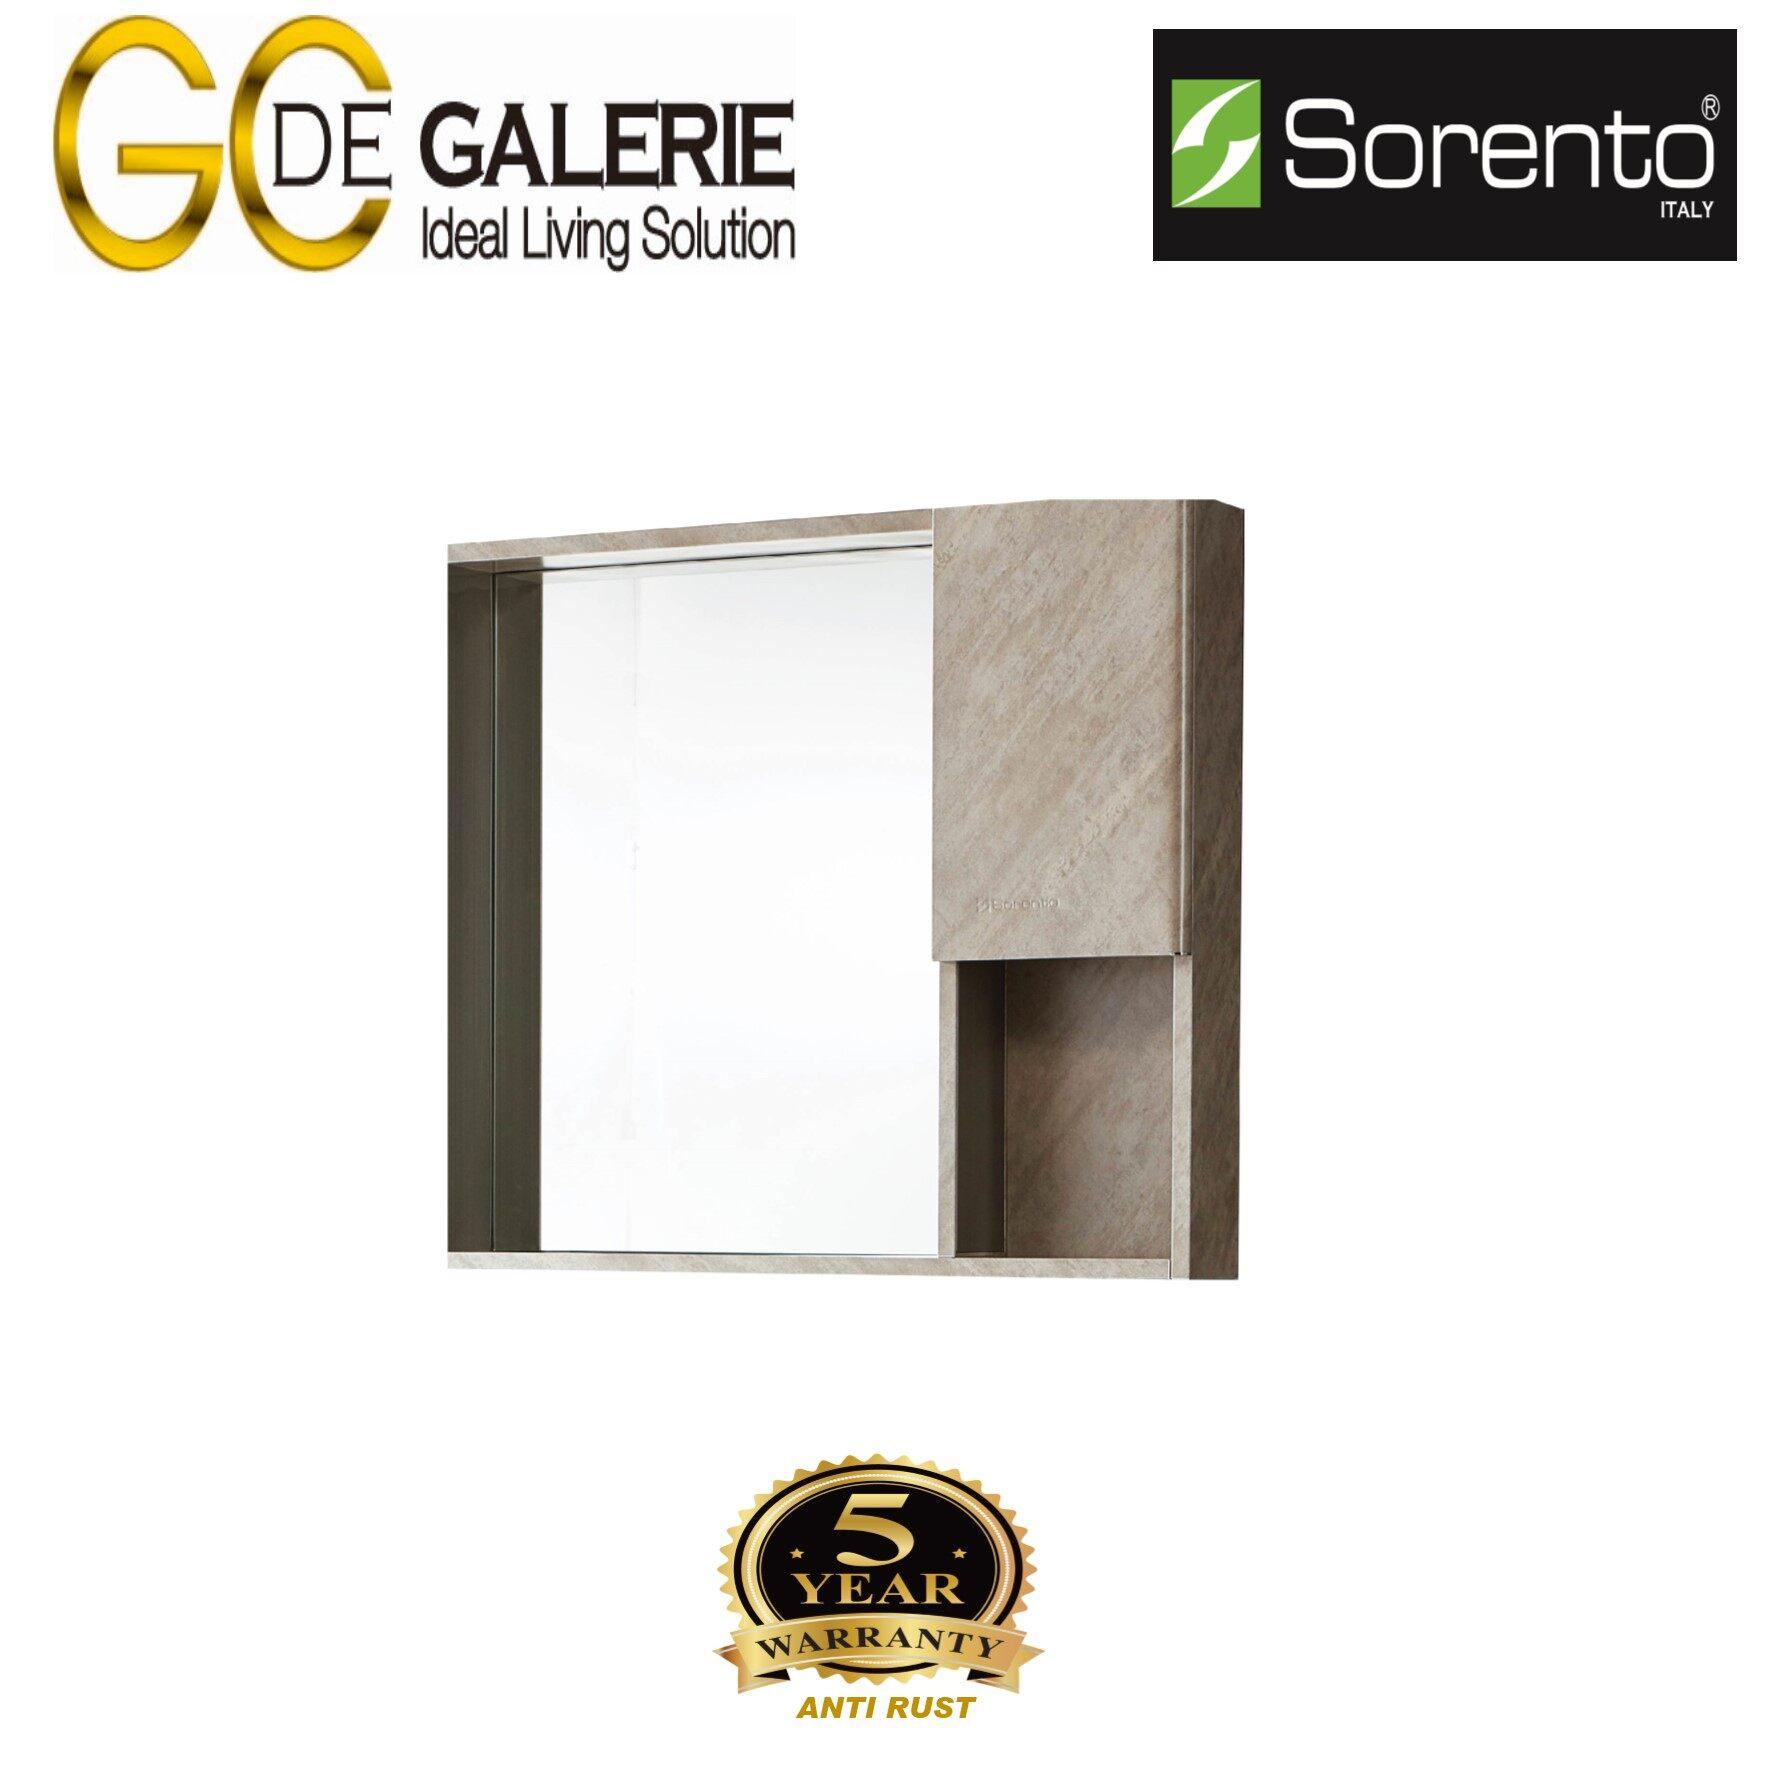 Sorento SRTMCB21825 Bathroom Stainless Steel Mirror Cabinet